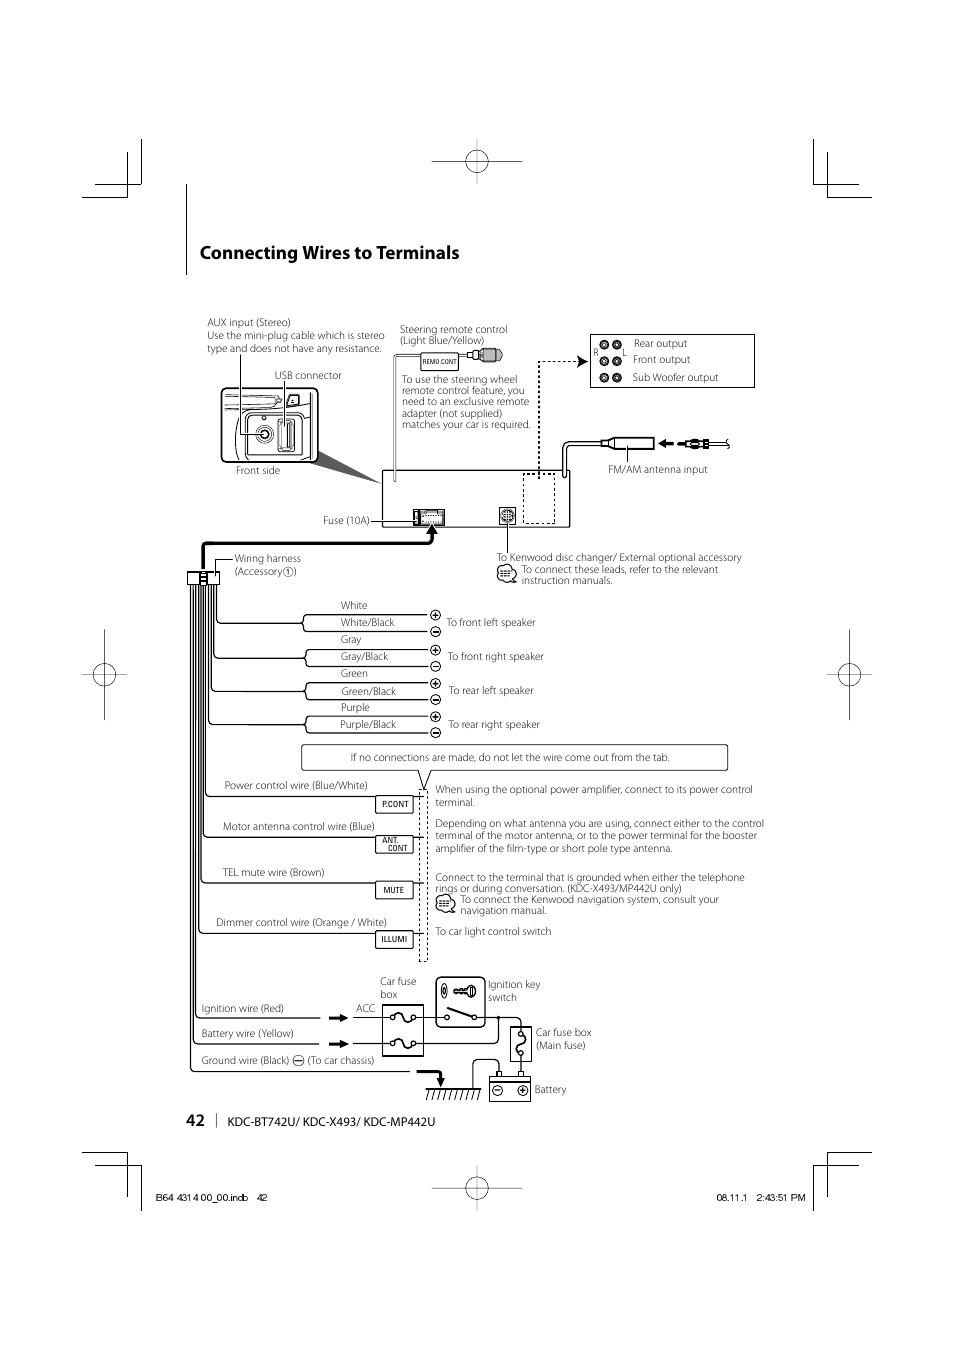 kenwood kdc bt742u page42?resize\\\\\=665%2C940 ebac bd150 wiring diagram boat wiring diagram \u2022 wiring diagram  at honlapkeszites.co